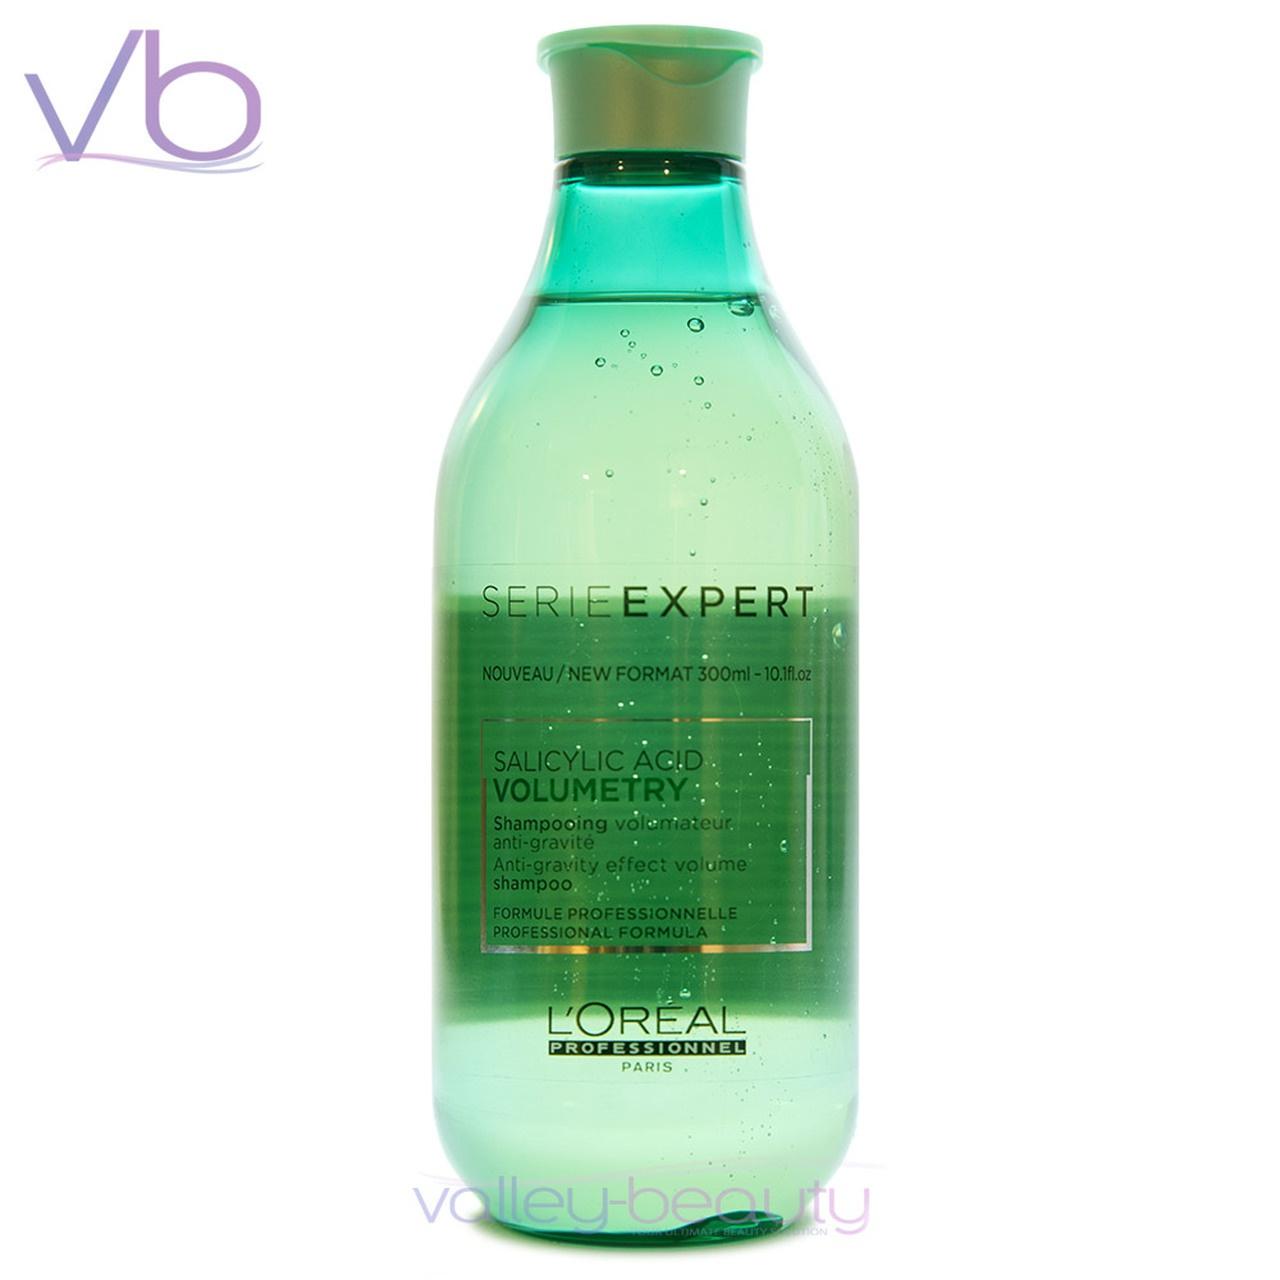 L'Oreal Professionnel Serie Expert Volumetry Shampoo